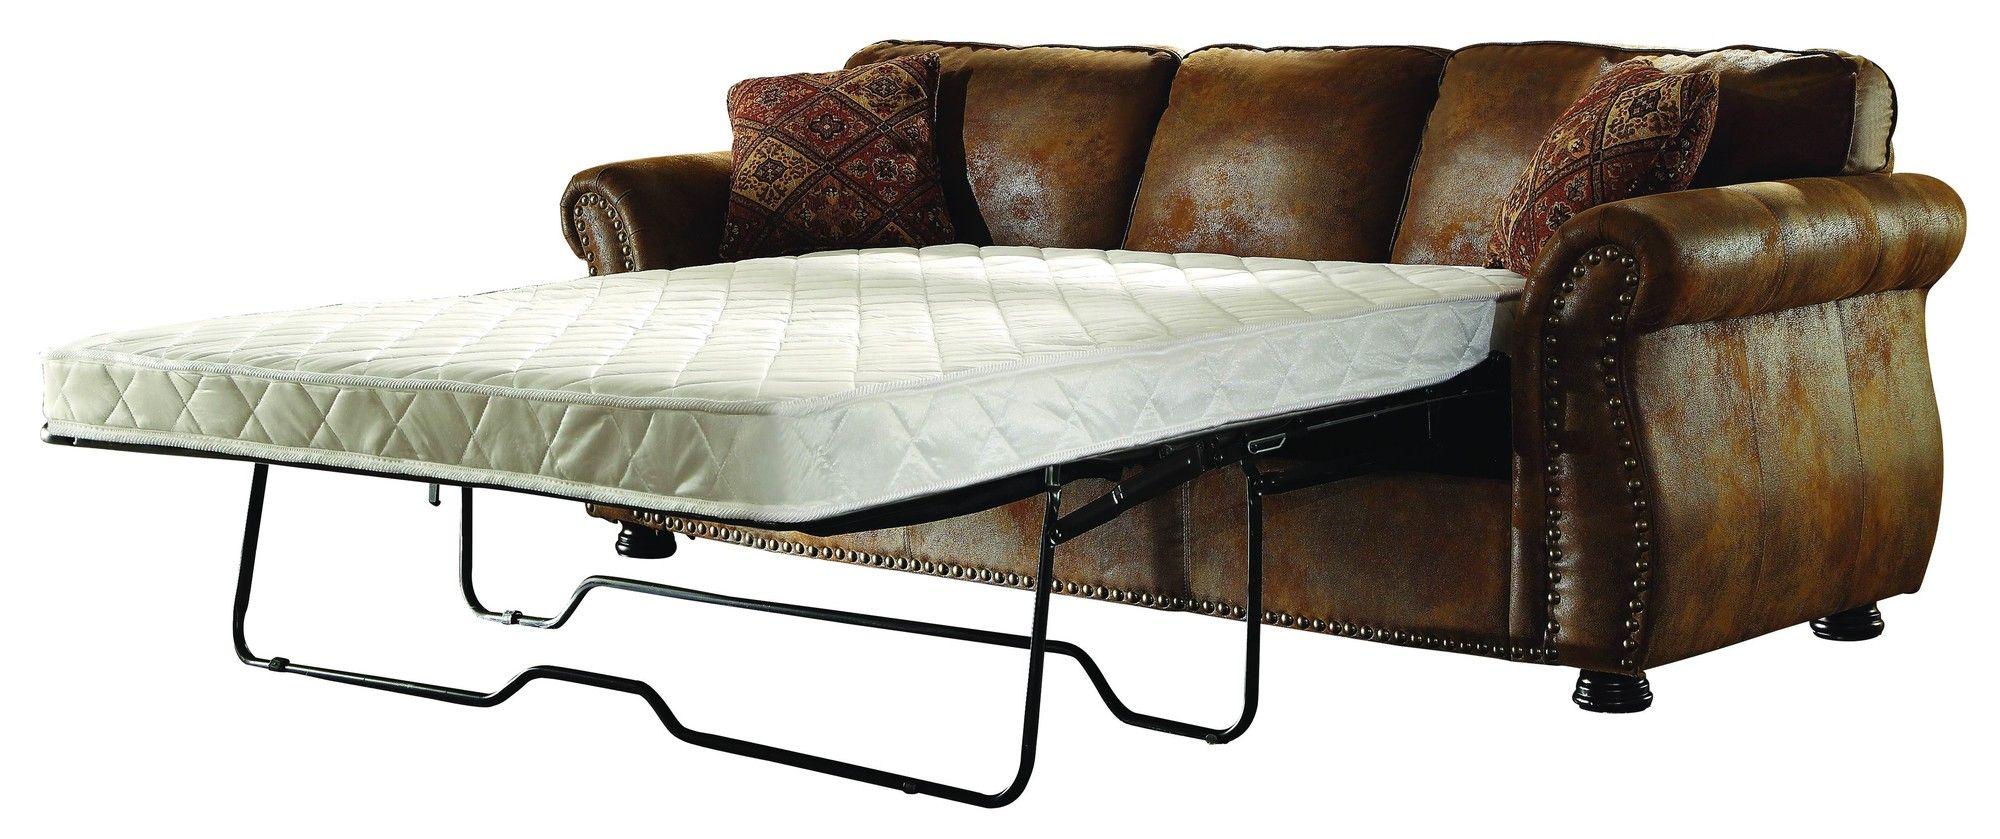 Orion Sleeper Sofa